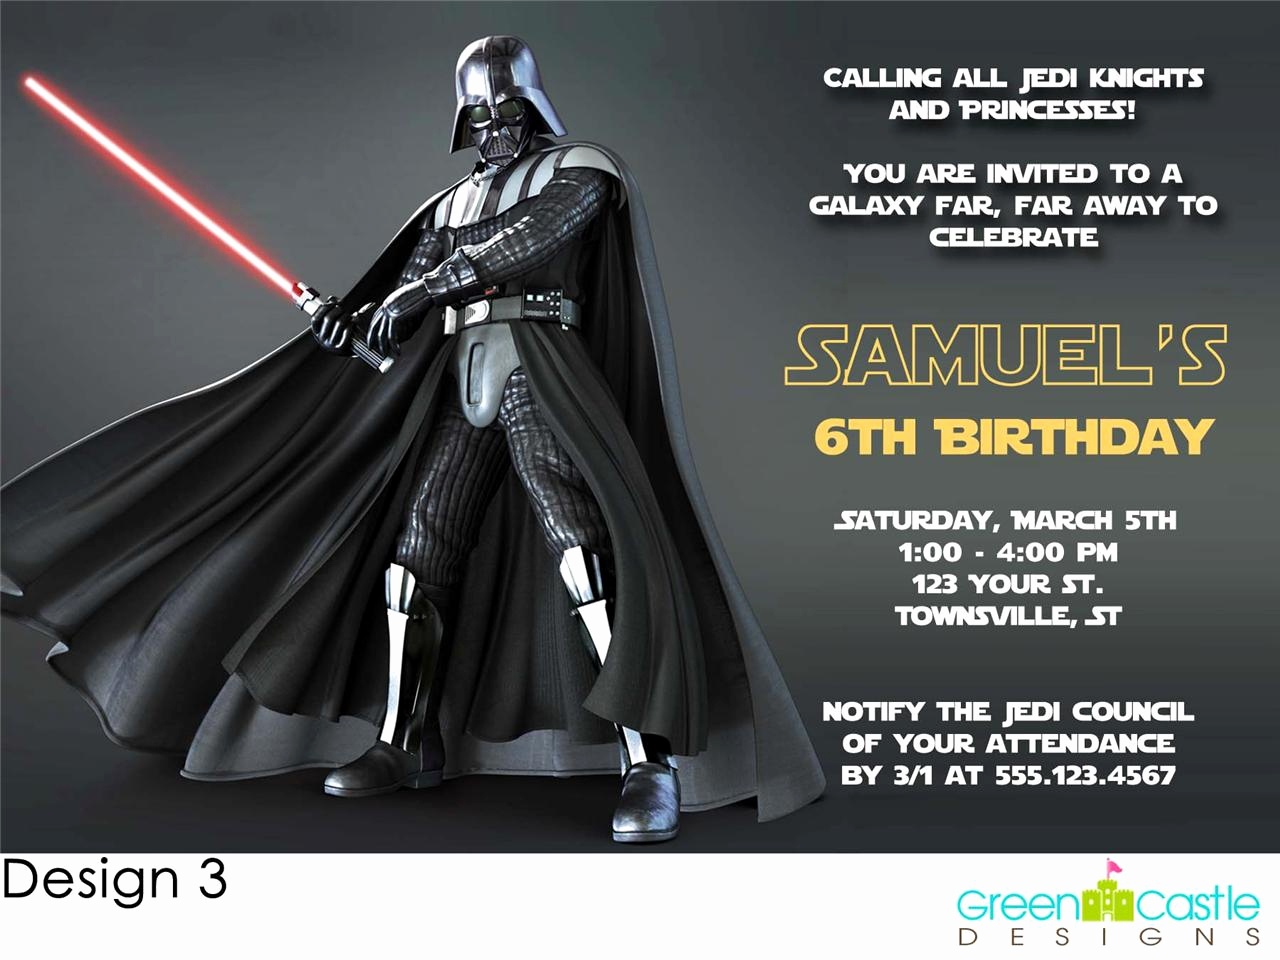 Star Wars Invitation Template Best Of 20 Star Wars Darth Vader Birthday Party Invitations